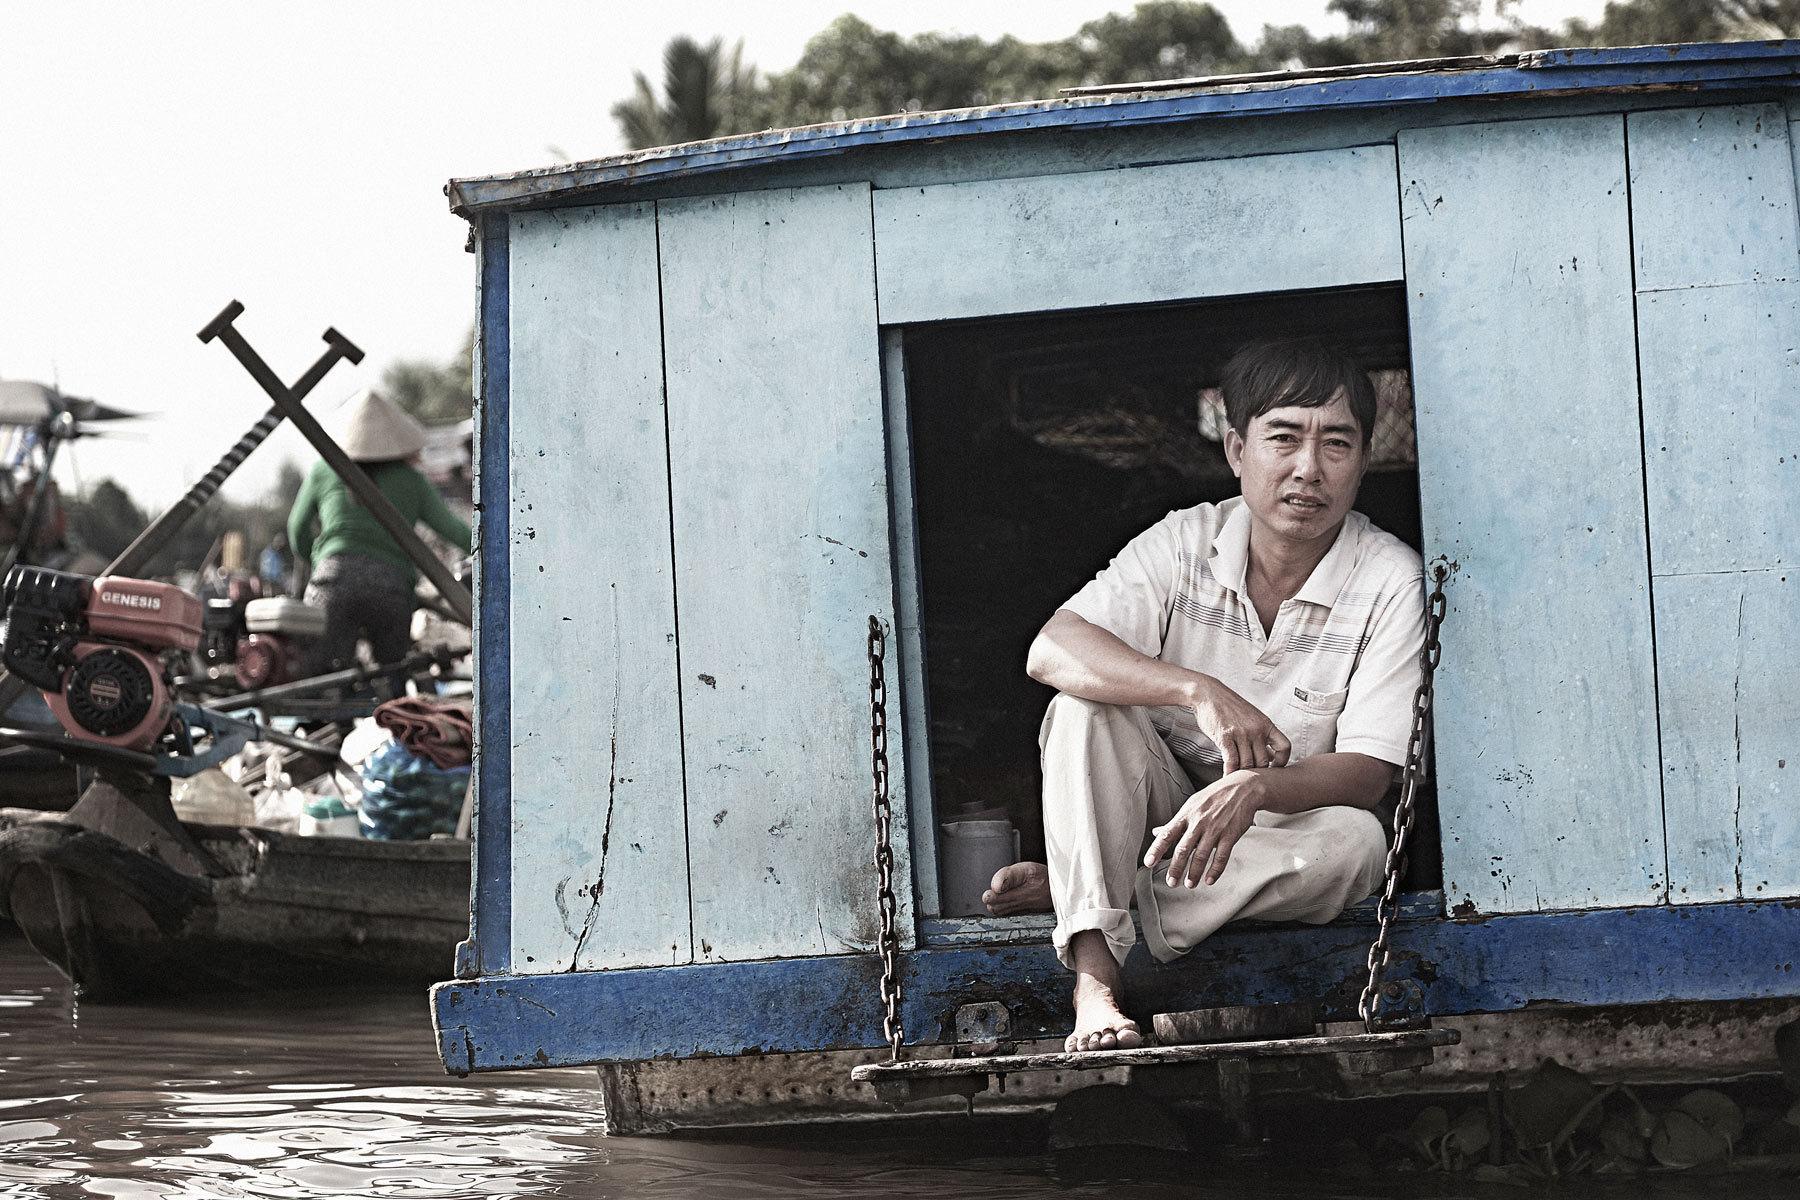 1r2015_16_vietnam_0988.jpg